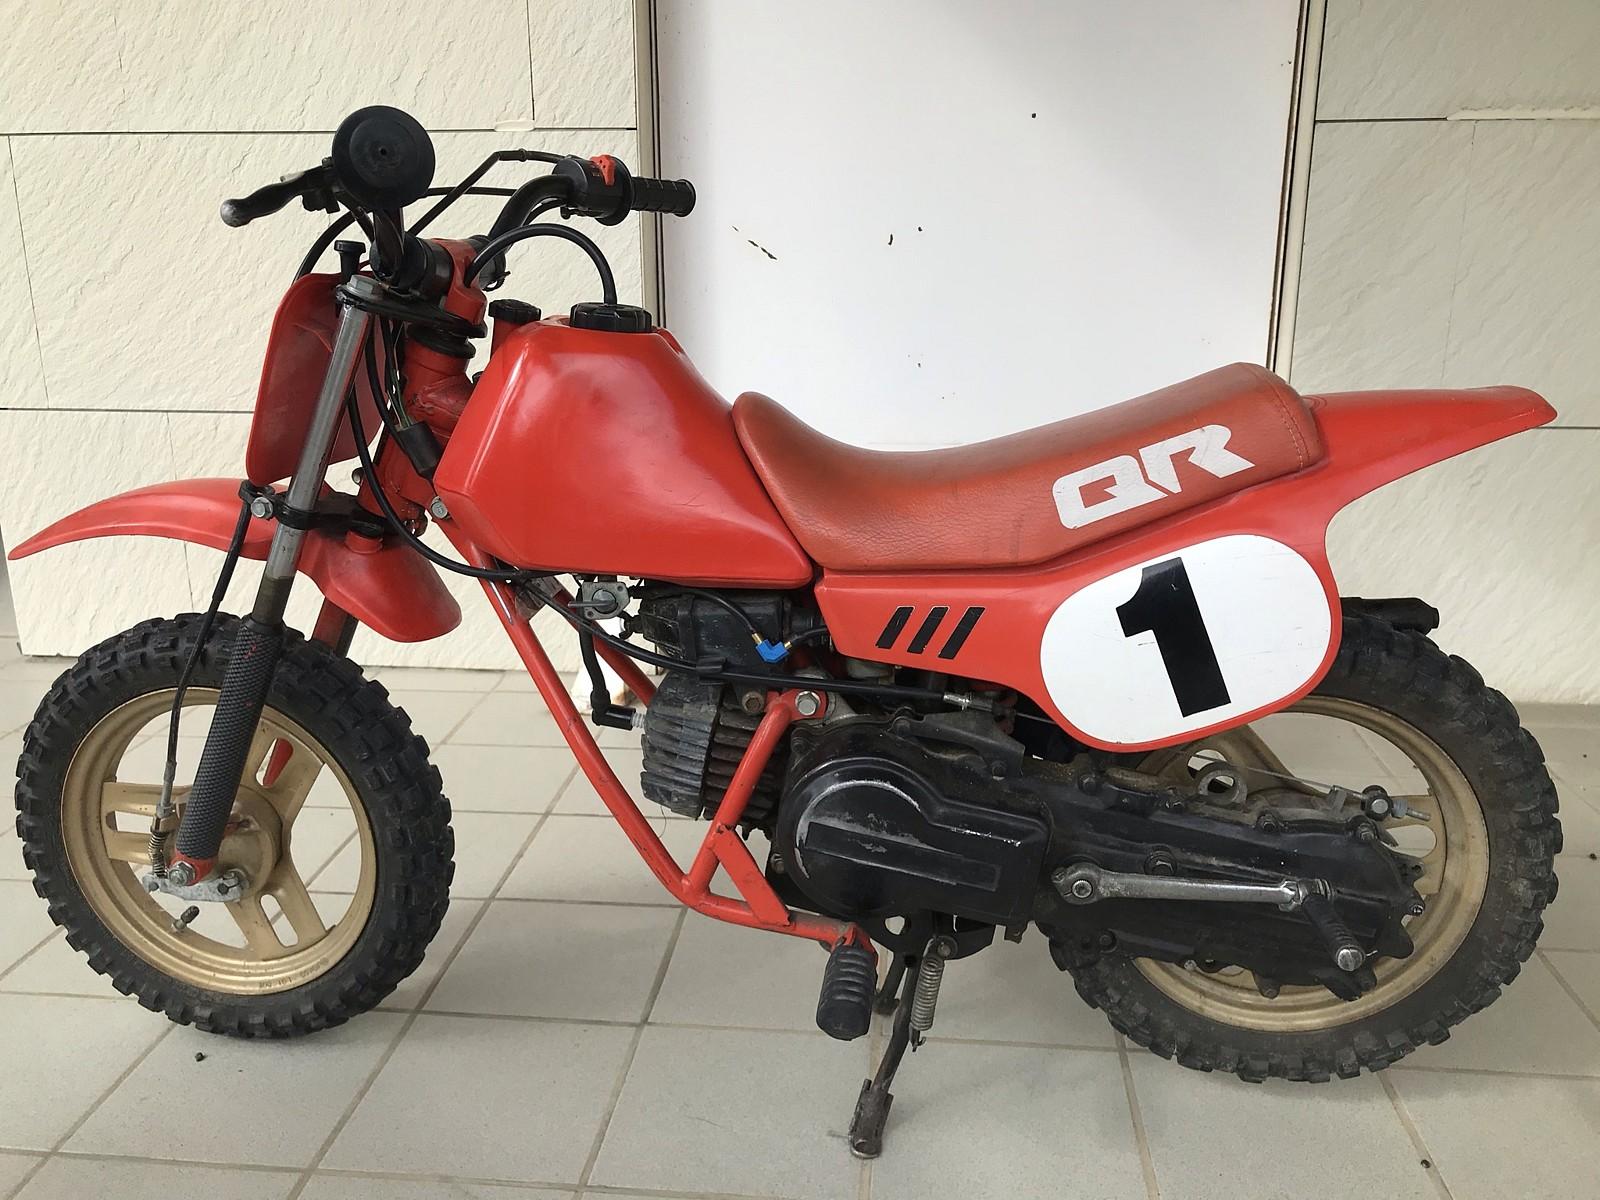 EBD429A9-B630-4469-90E8-CCCADC43EDDF - Godcho - Motocross Pictures - Vital MX